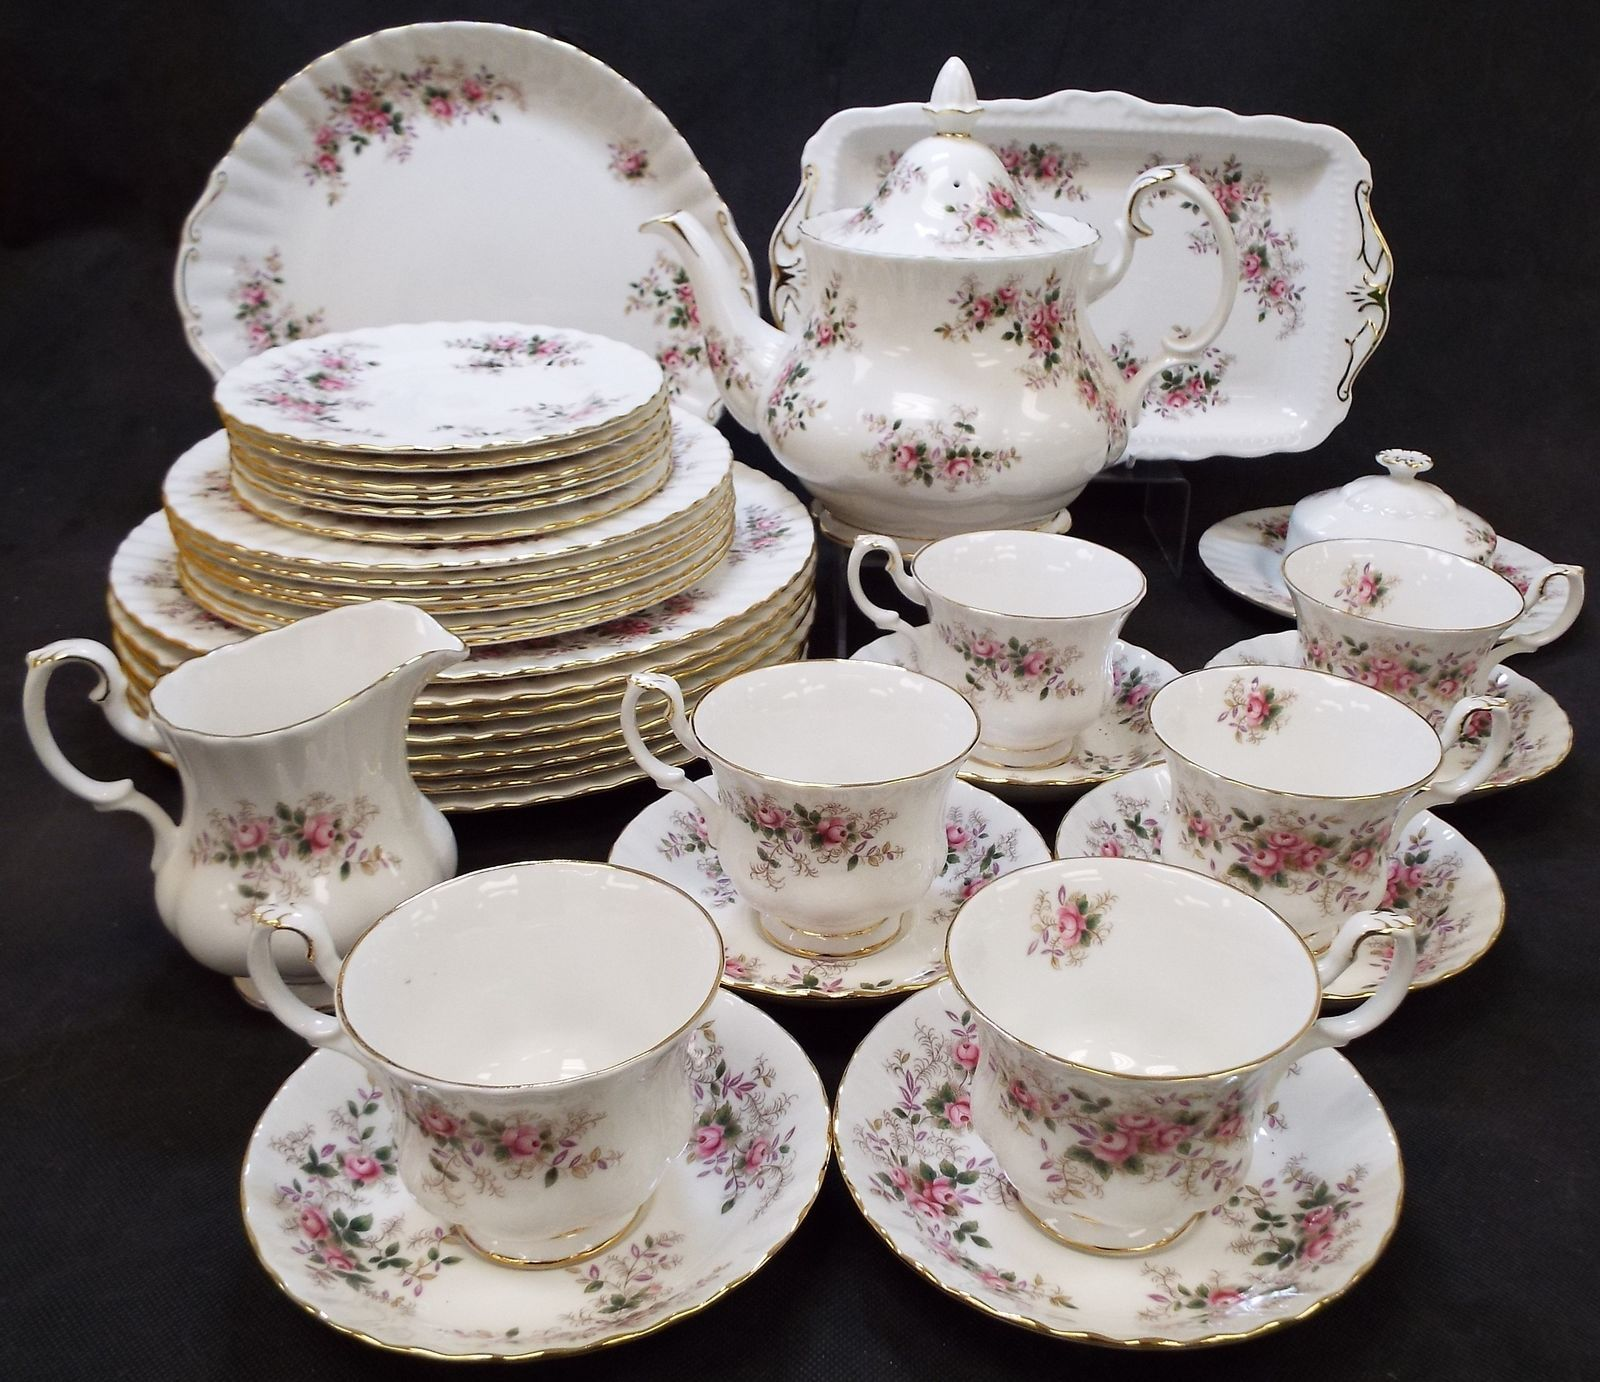 Royal Albert Bone China 37 Pieces Tea Dinner Set Made In England C41 Ebay Tea Dinner Sets Bone China